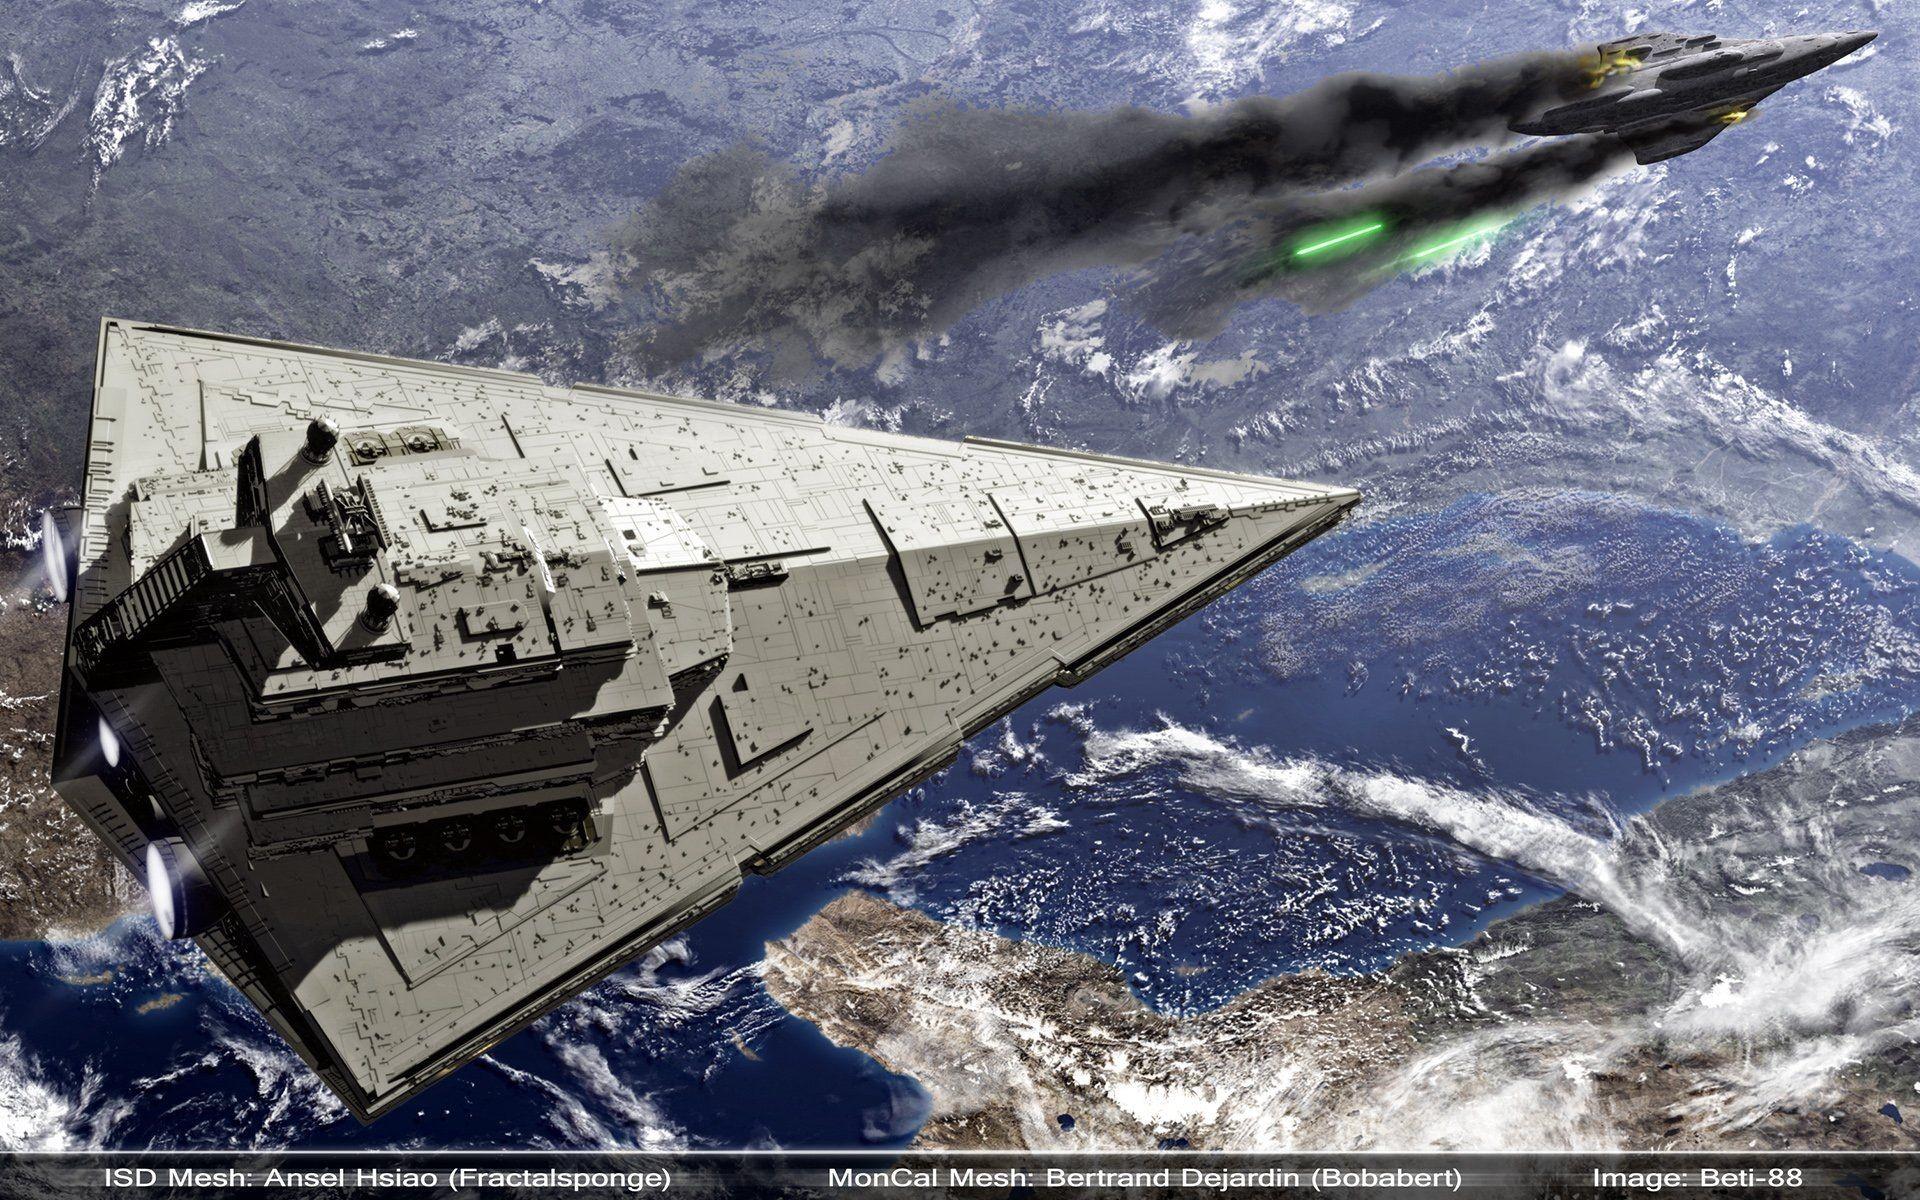 Star Wars Imperial Star Destroyer Wallpaper images